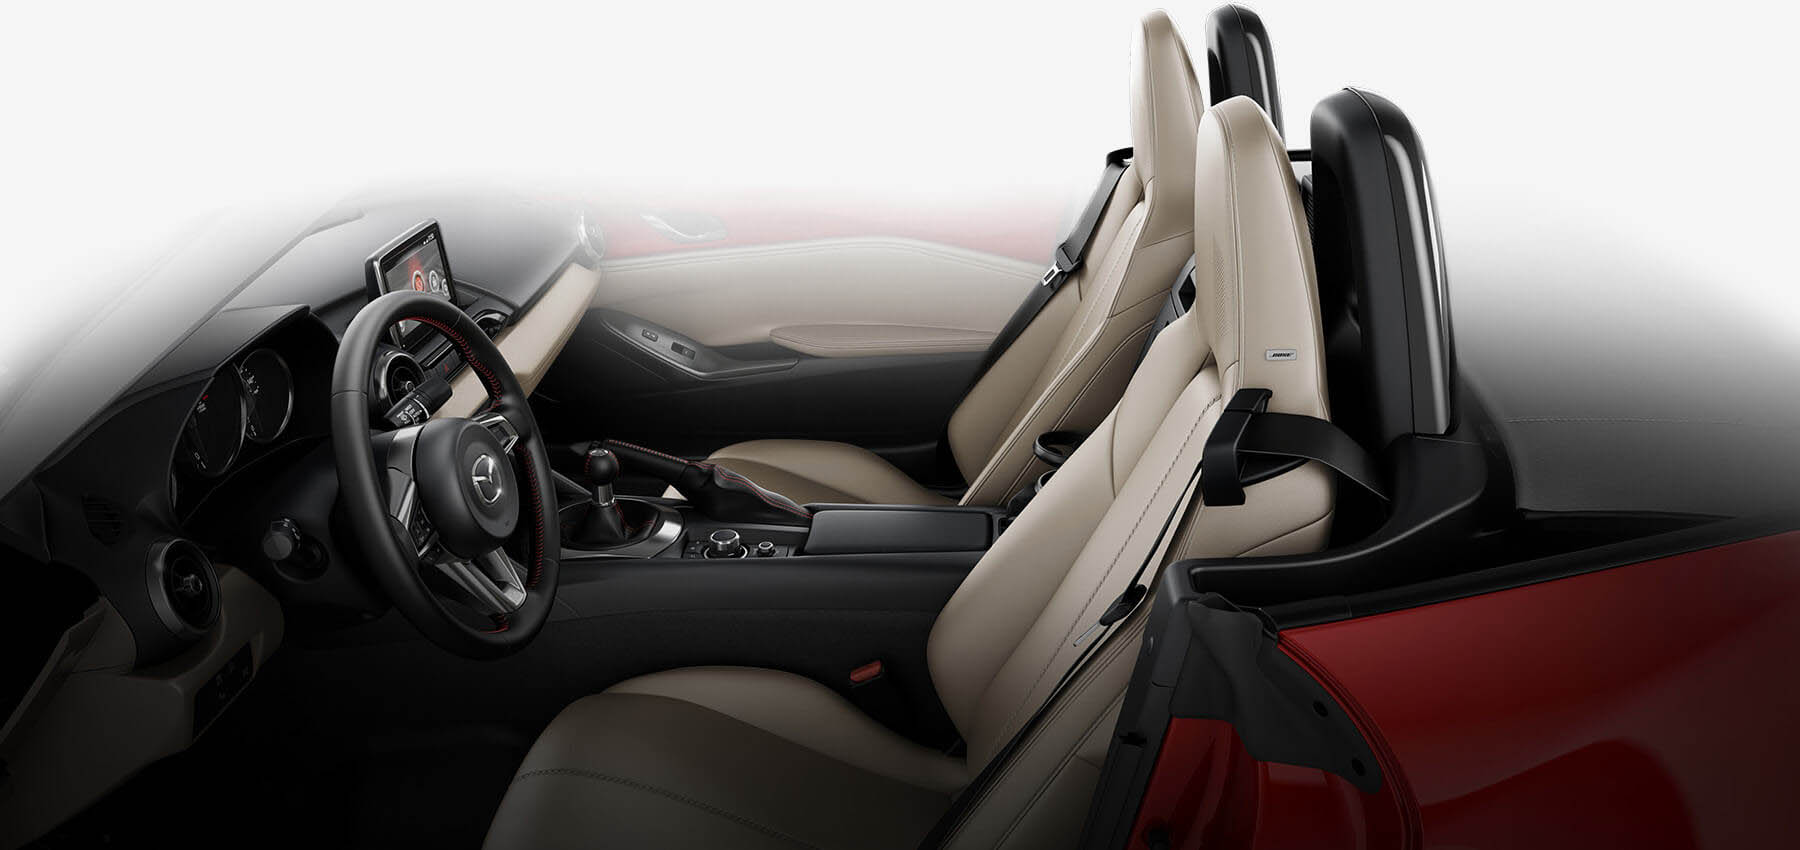 2017 Mazda Mx 5 Miata Rf Grand Touring >> Mazda MX-5 RF 2018 | Mazda México